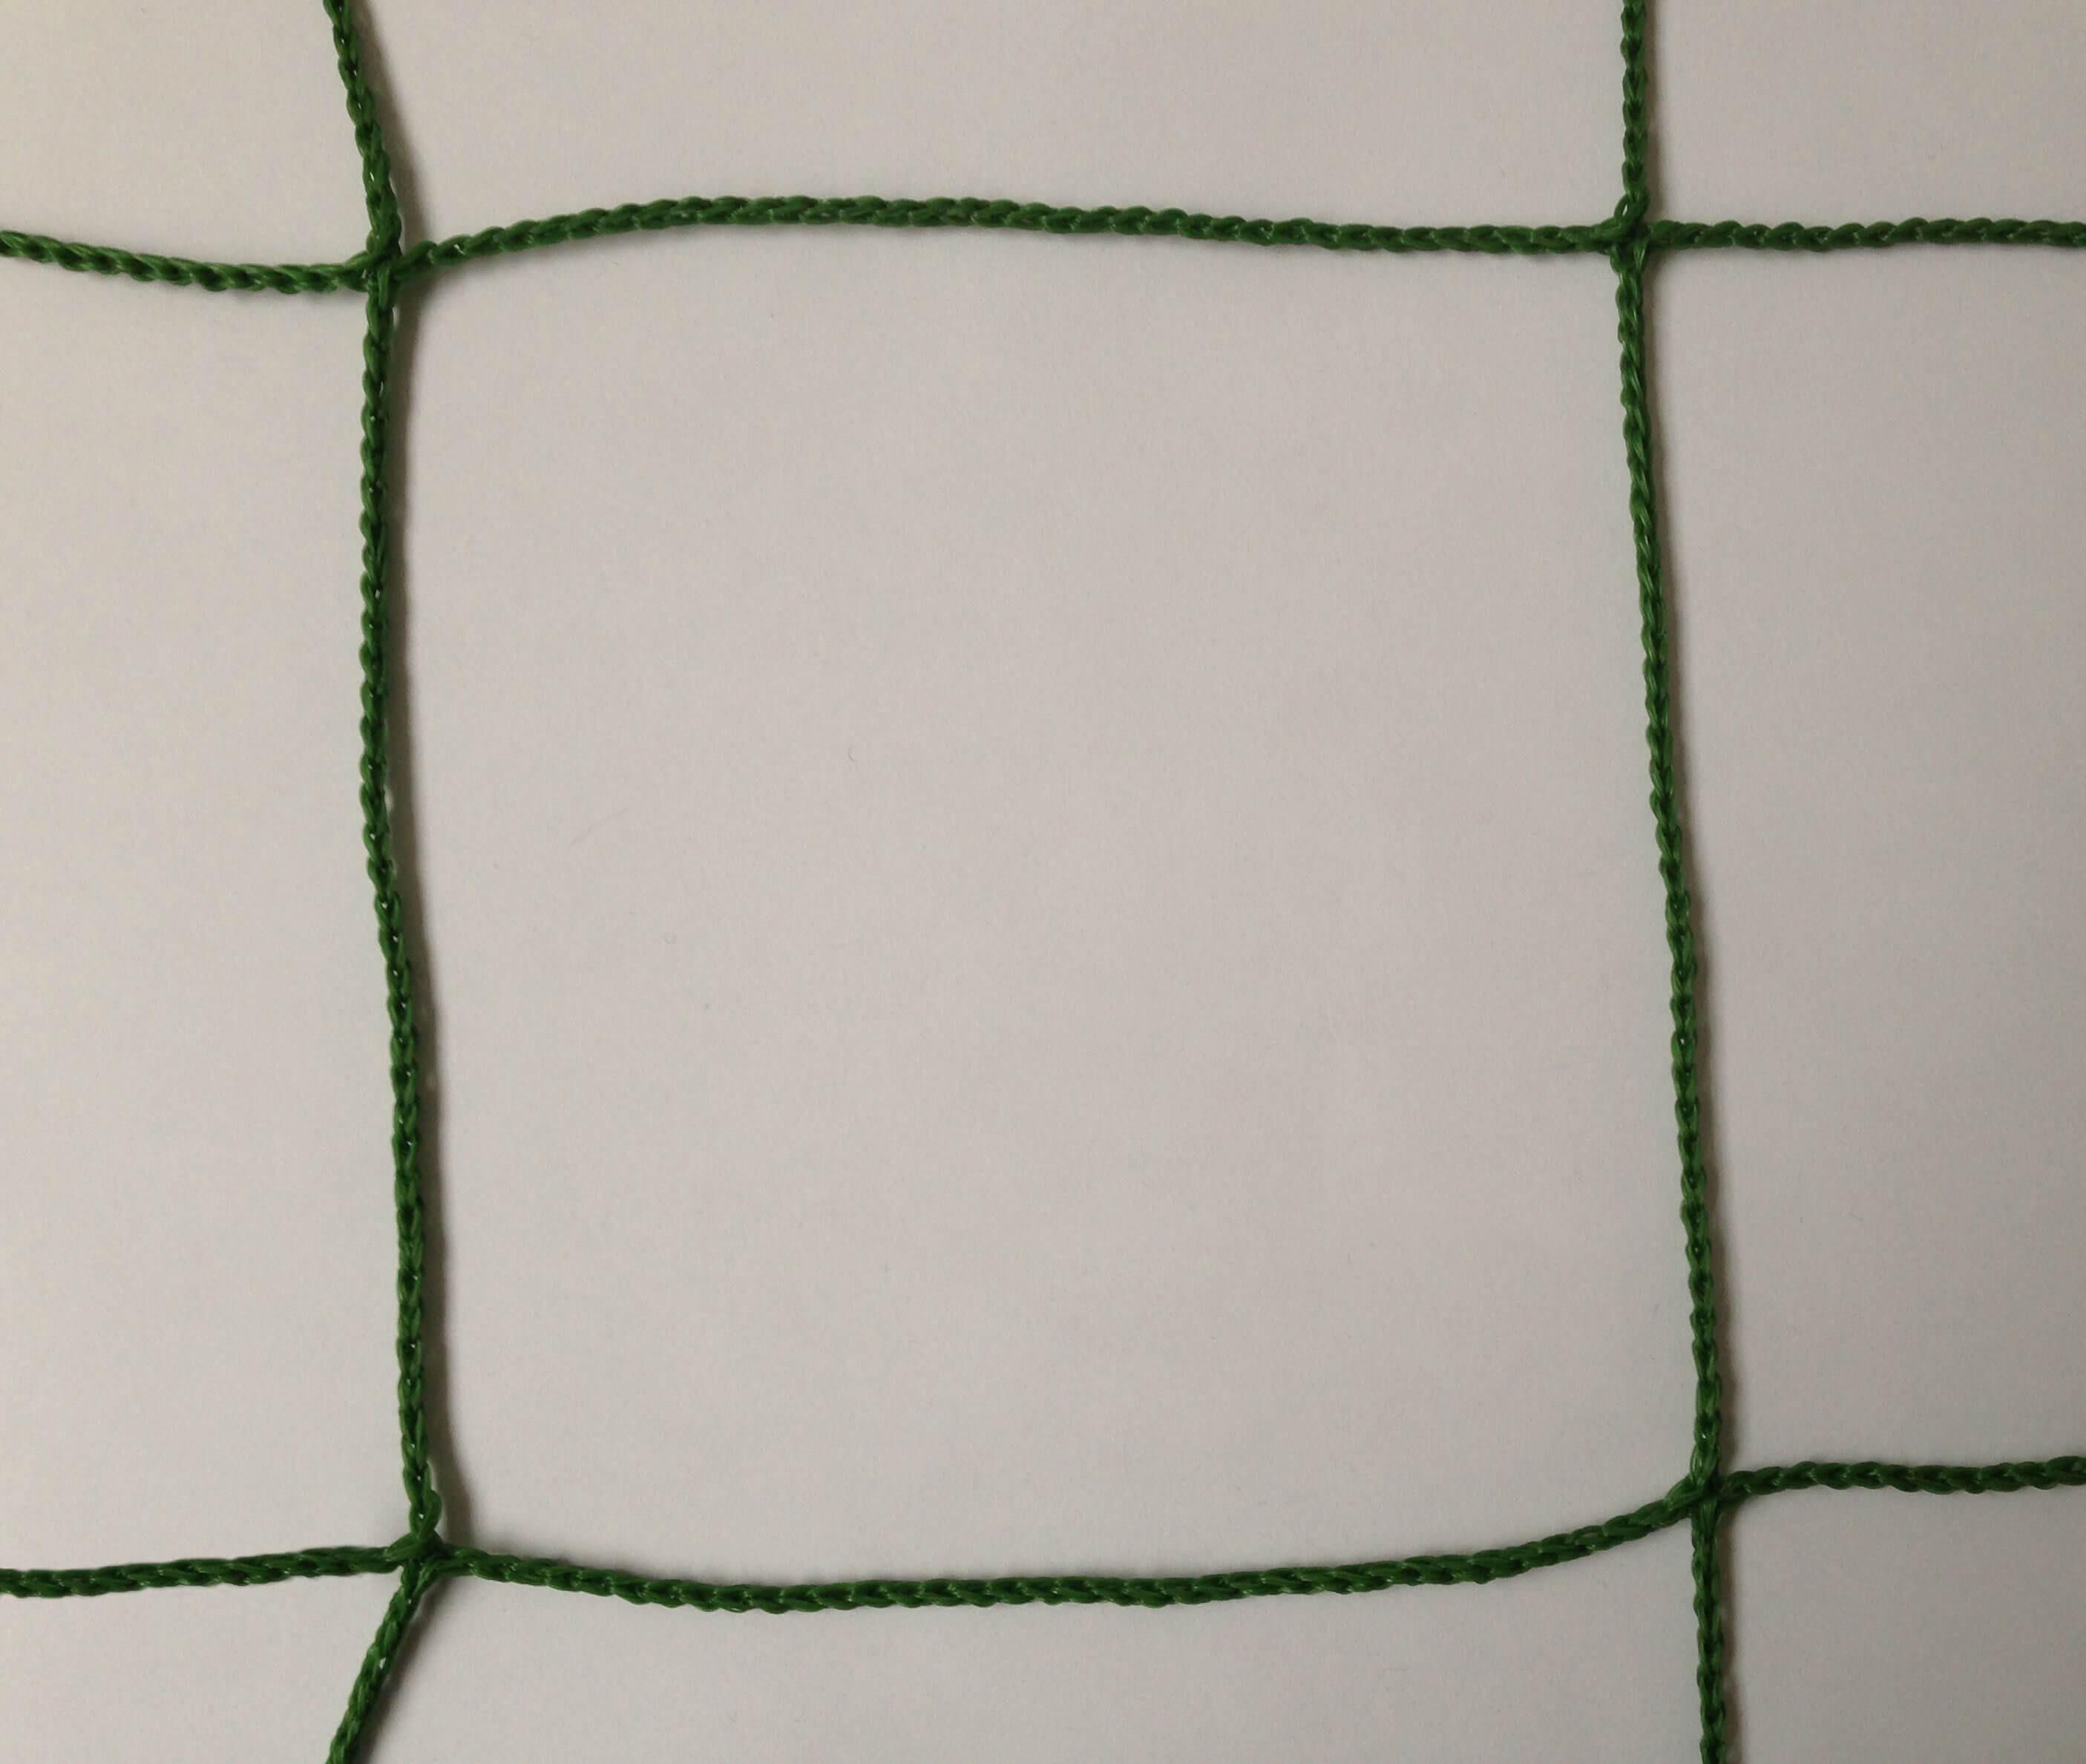 Filet pare-ballons - Mailles 145 mm - ∅ 2,5 mm